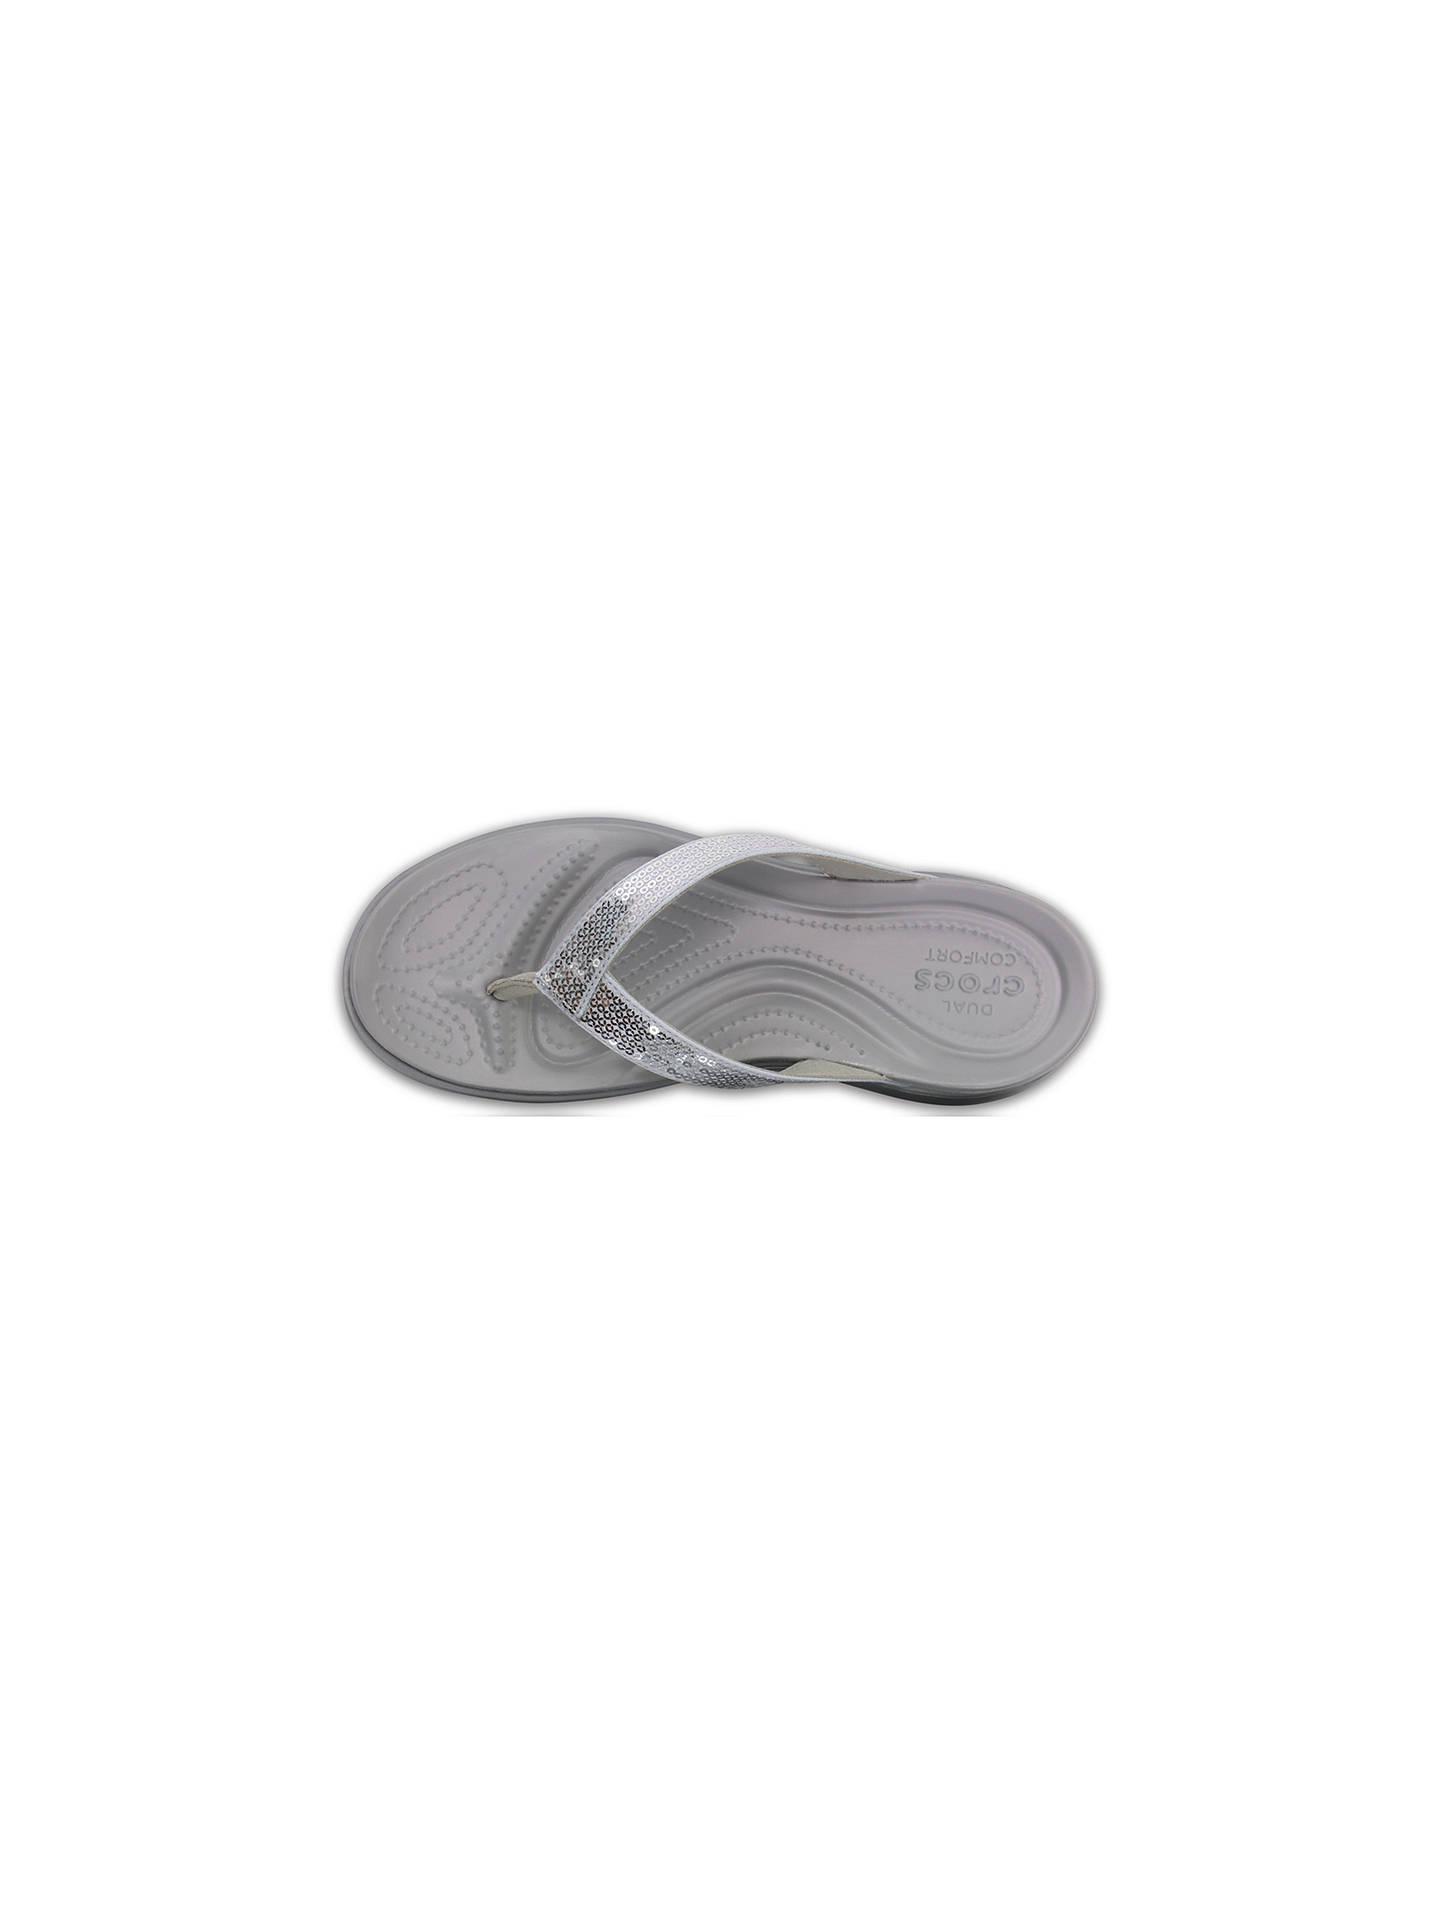 5035615bf35 ... Buy Crocs Capri V Sequin Flip Flops